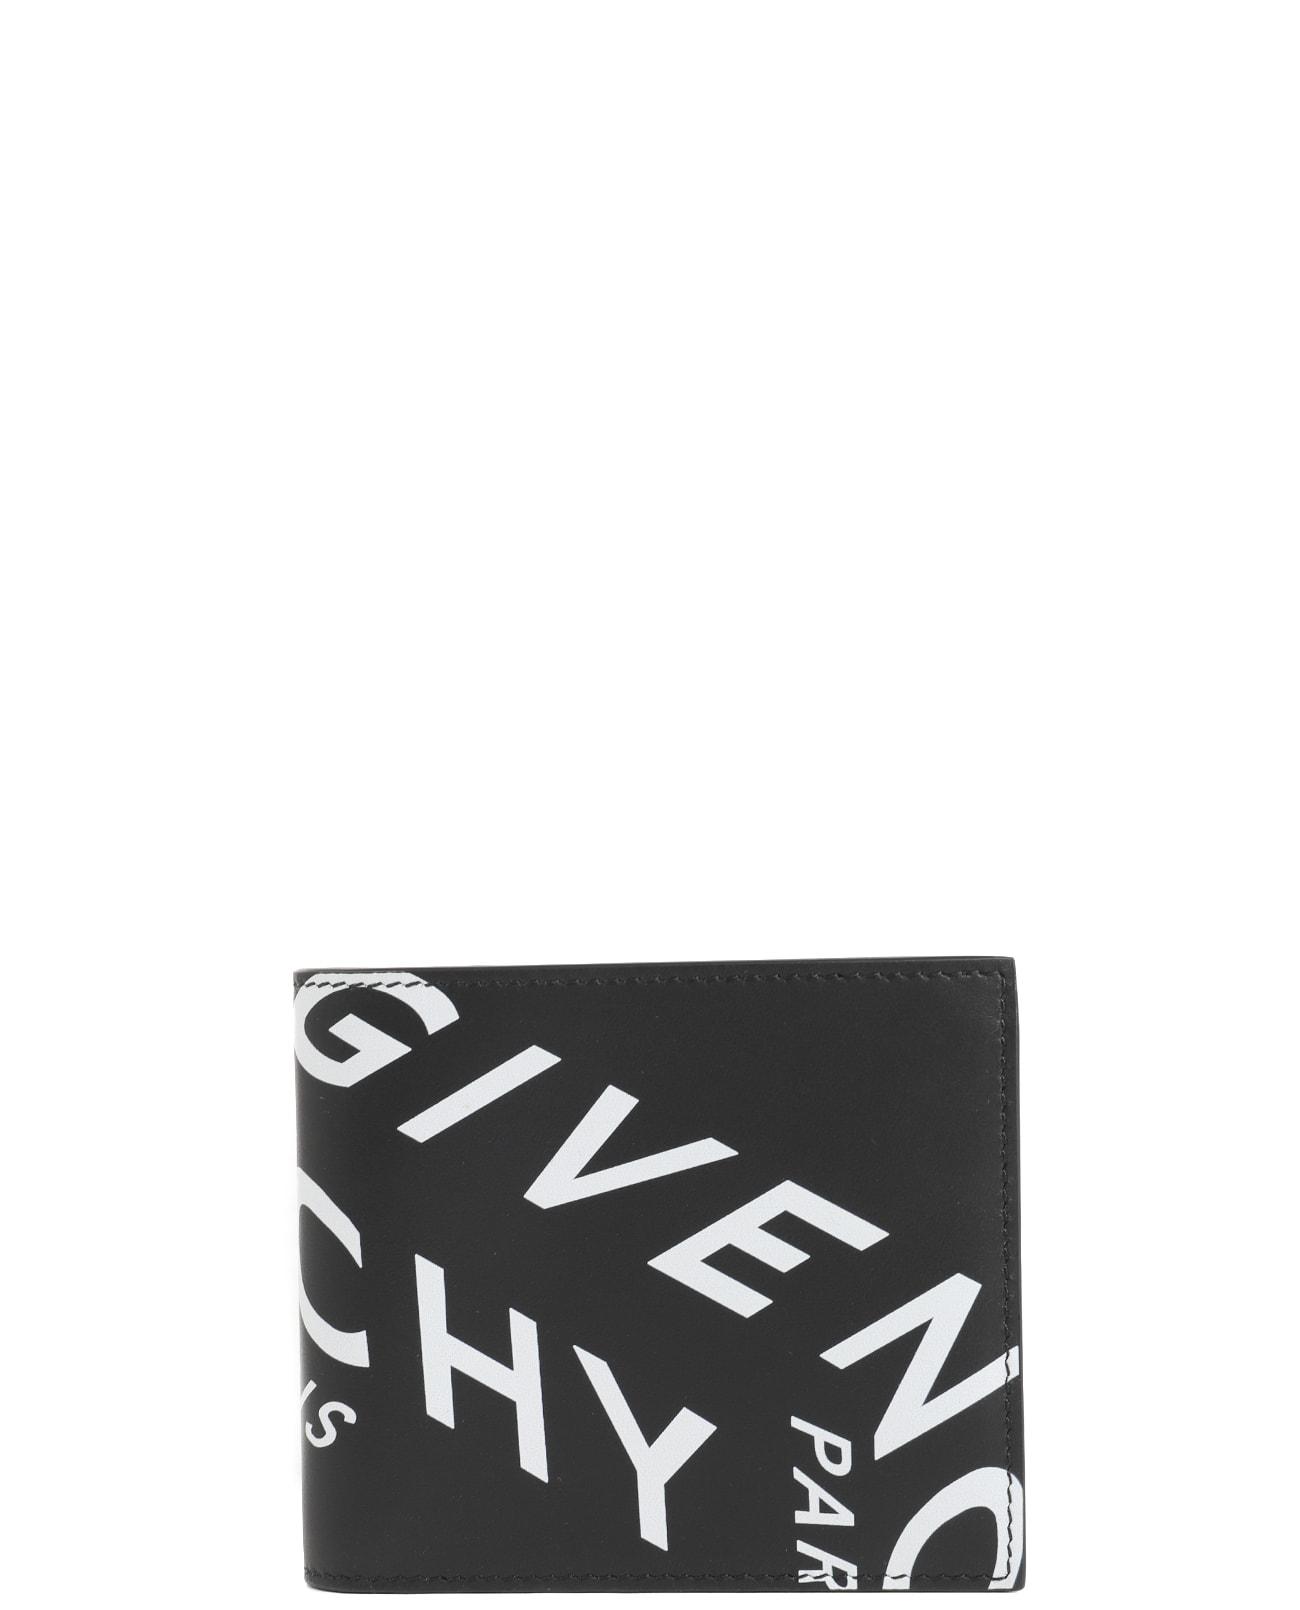 Givenchy Black Billfold Wallet In Nero/bianco